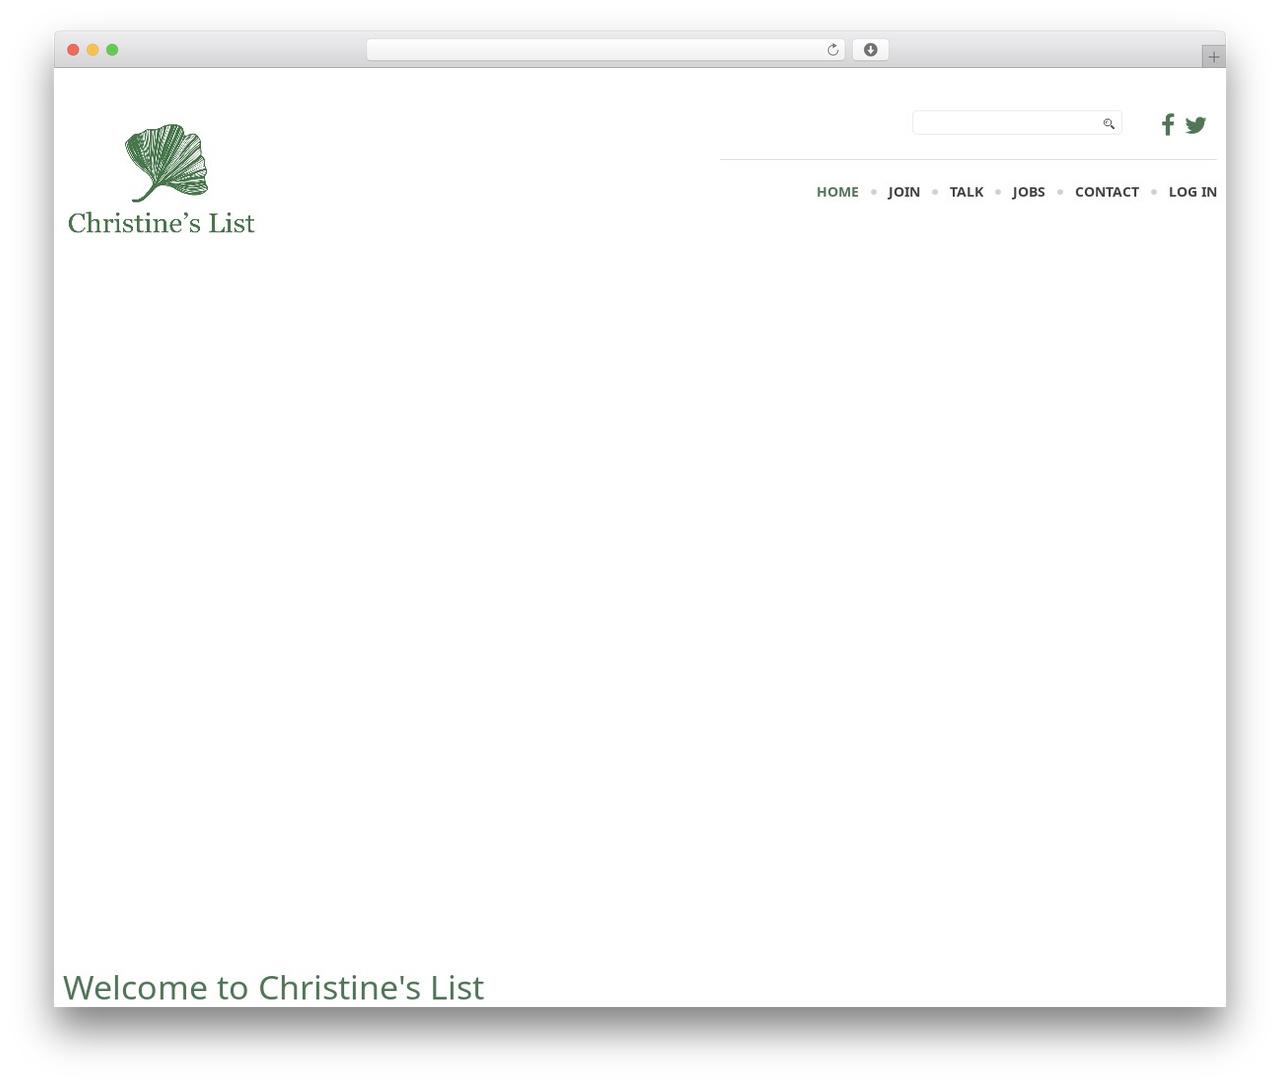 WP template cherry - christineslist.org